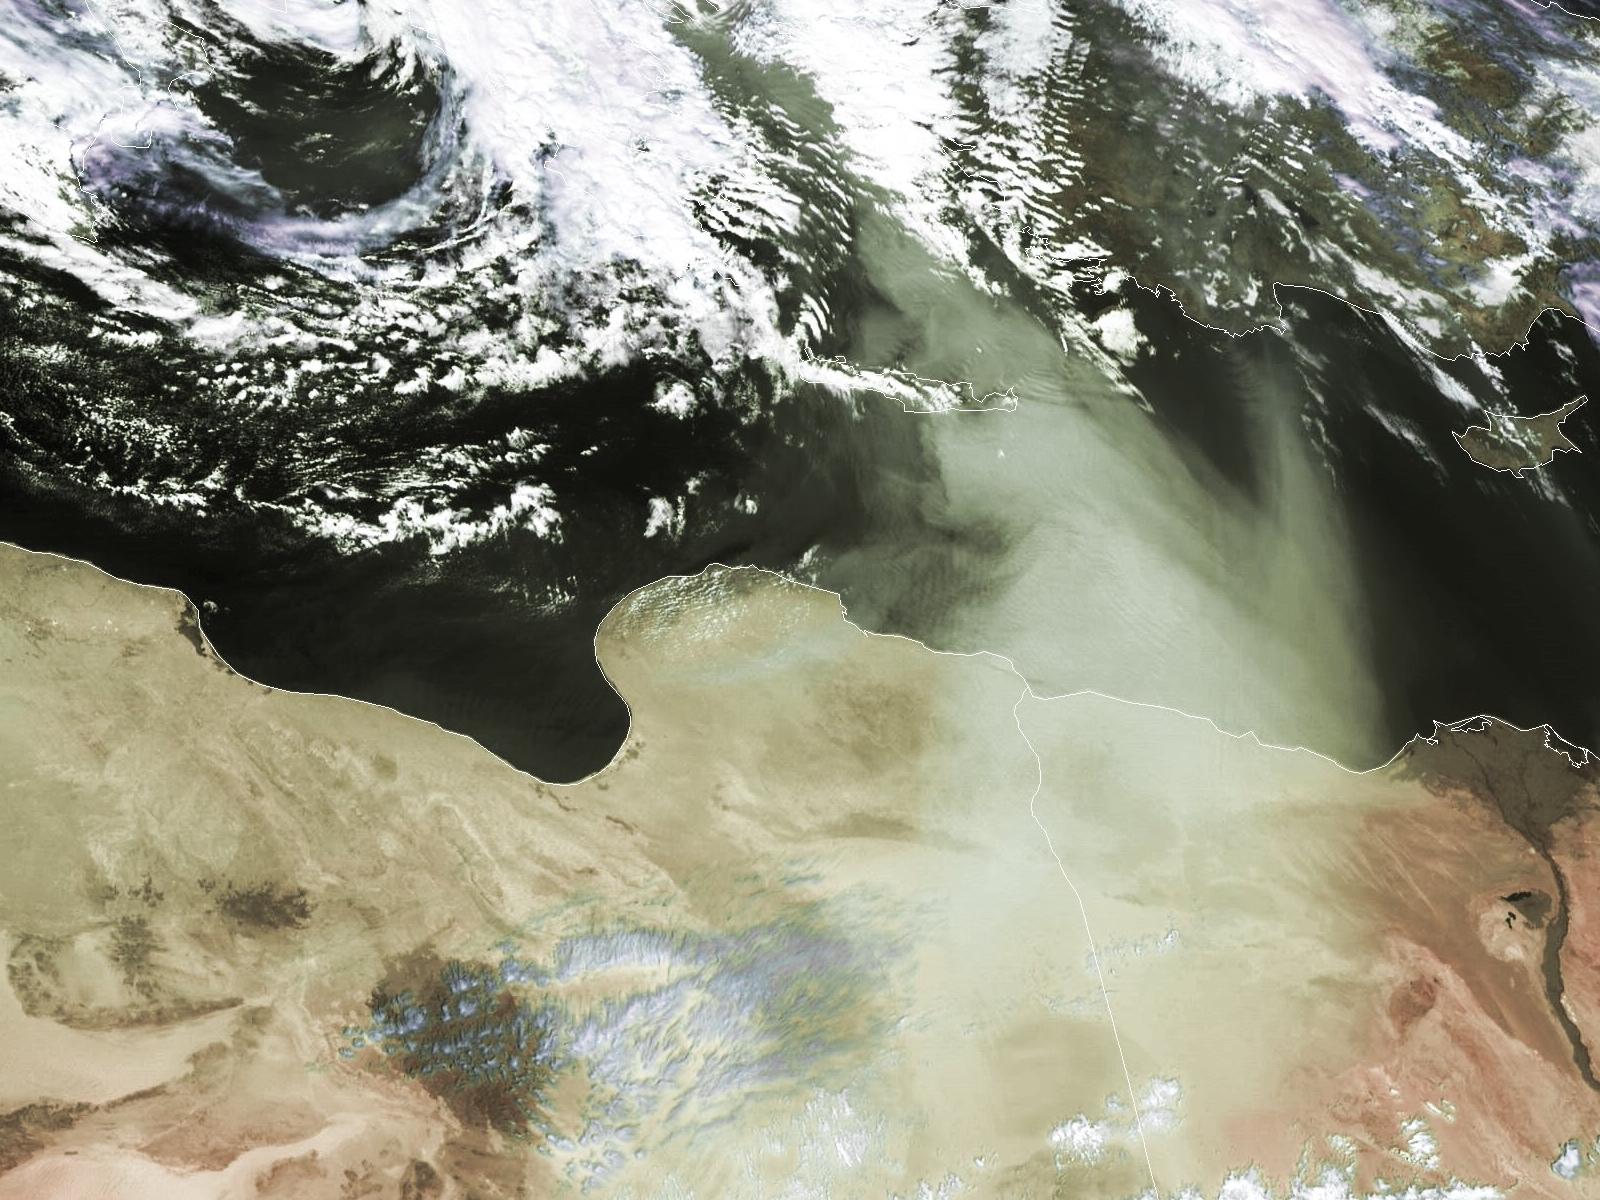 Met-8, 24 February 2006, 12:00 UTC